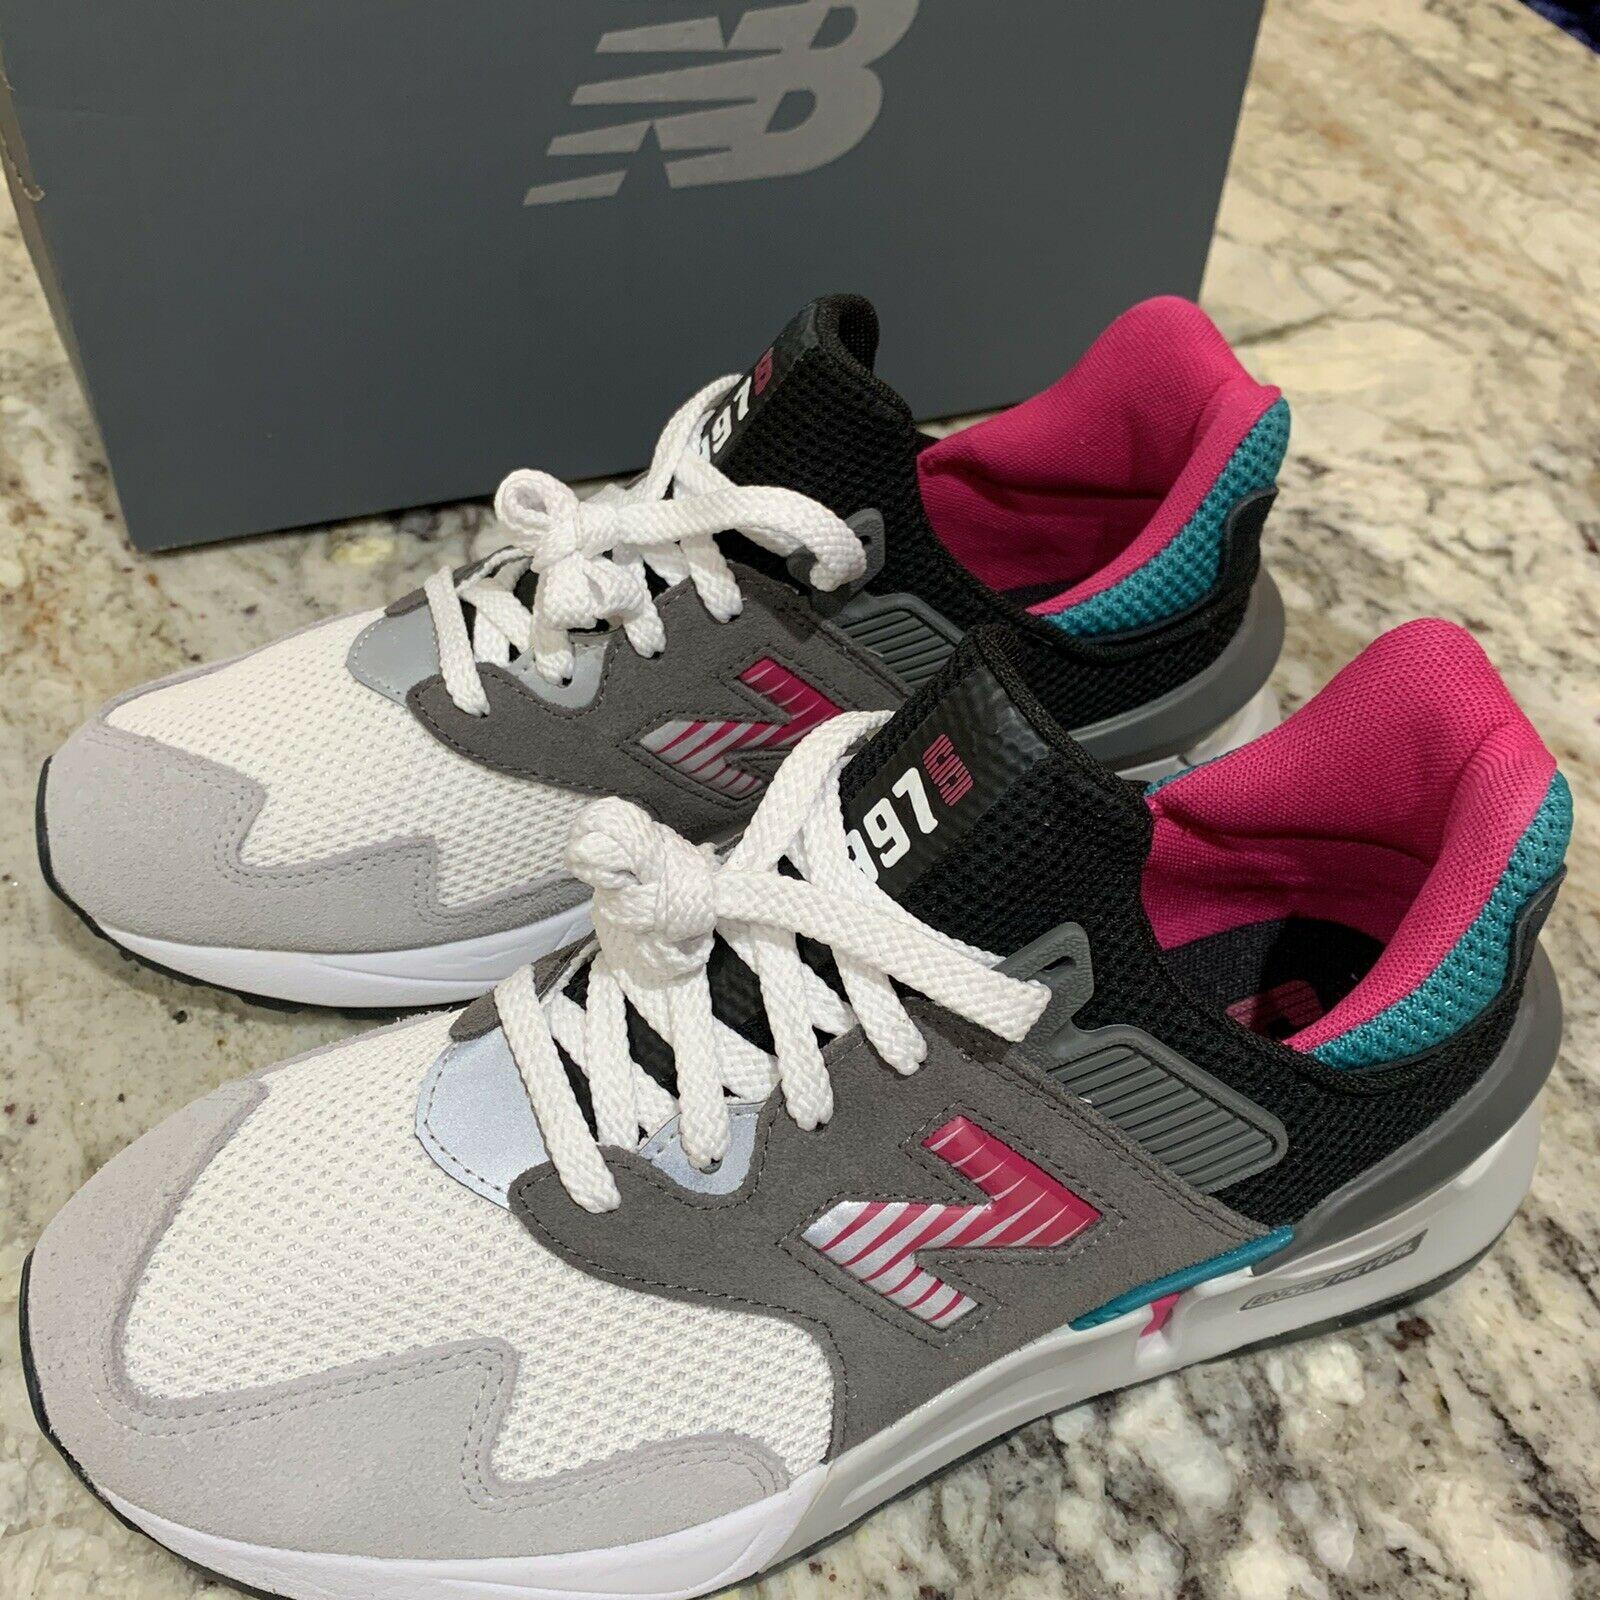 New Balance 997 S South Beach